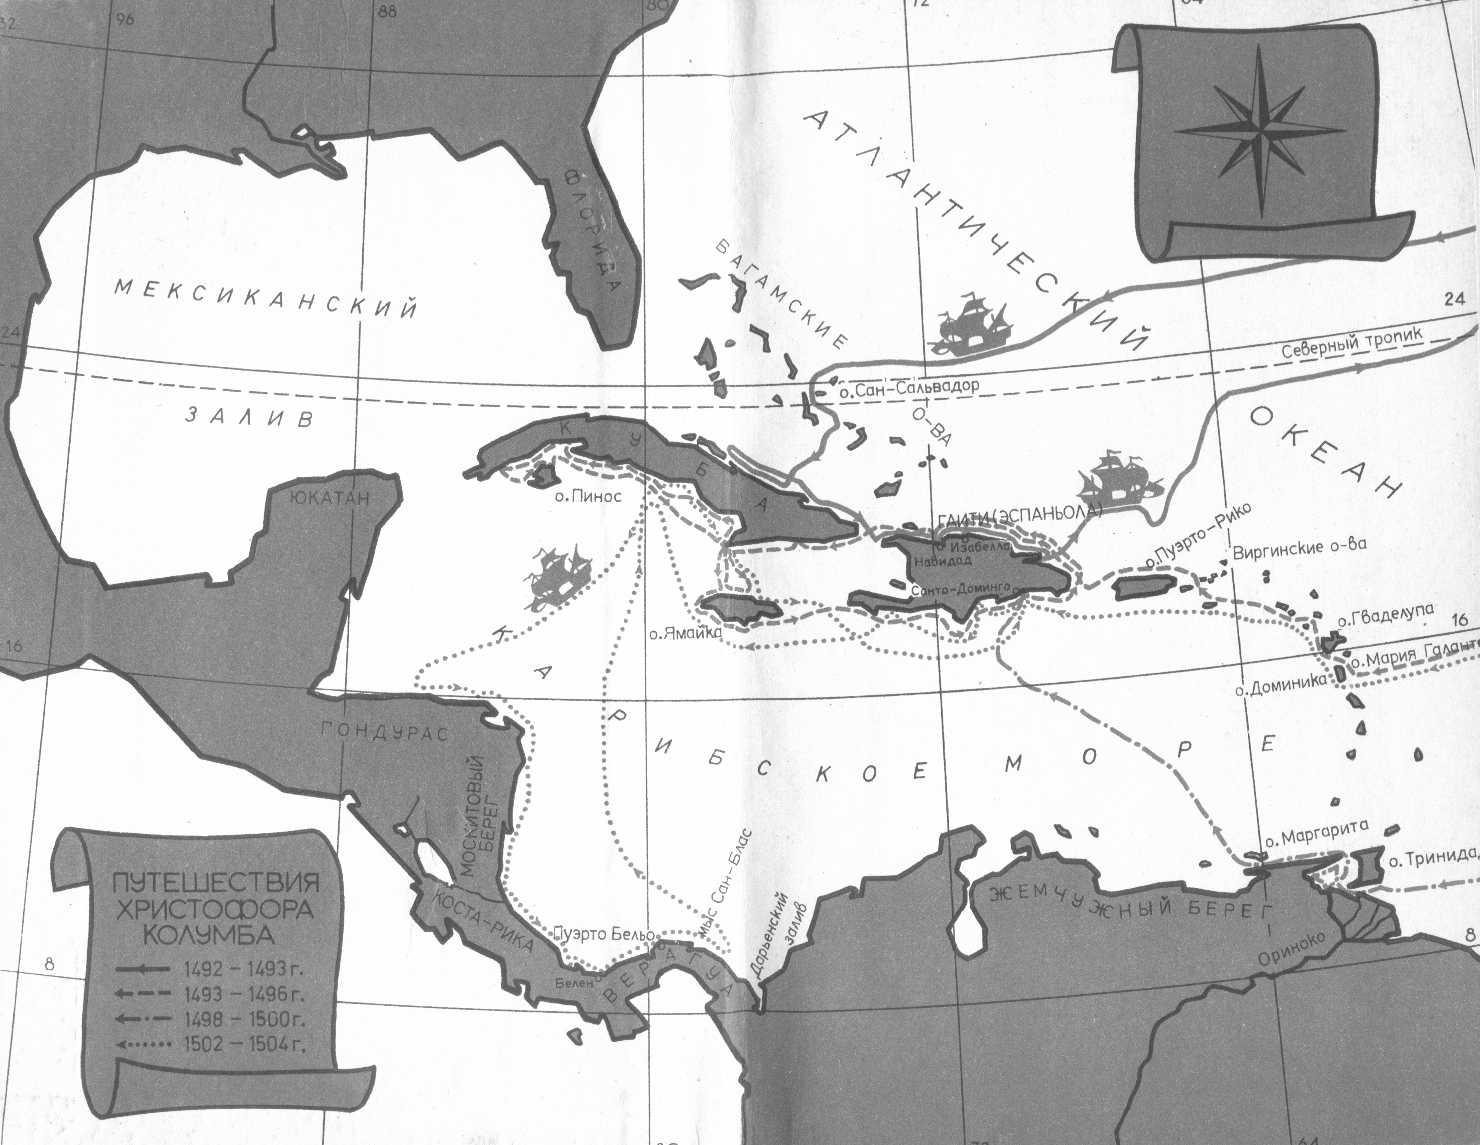 Путешествия христофора колумба карта